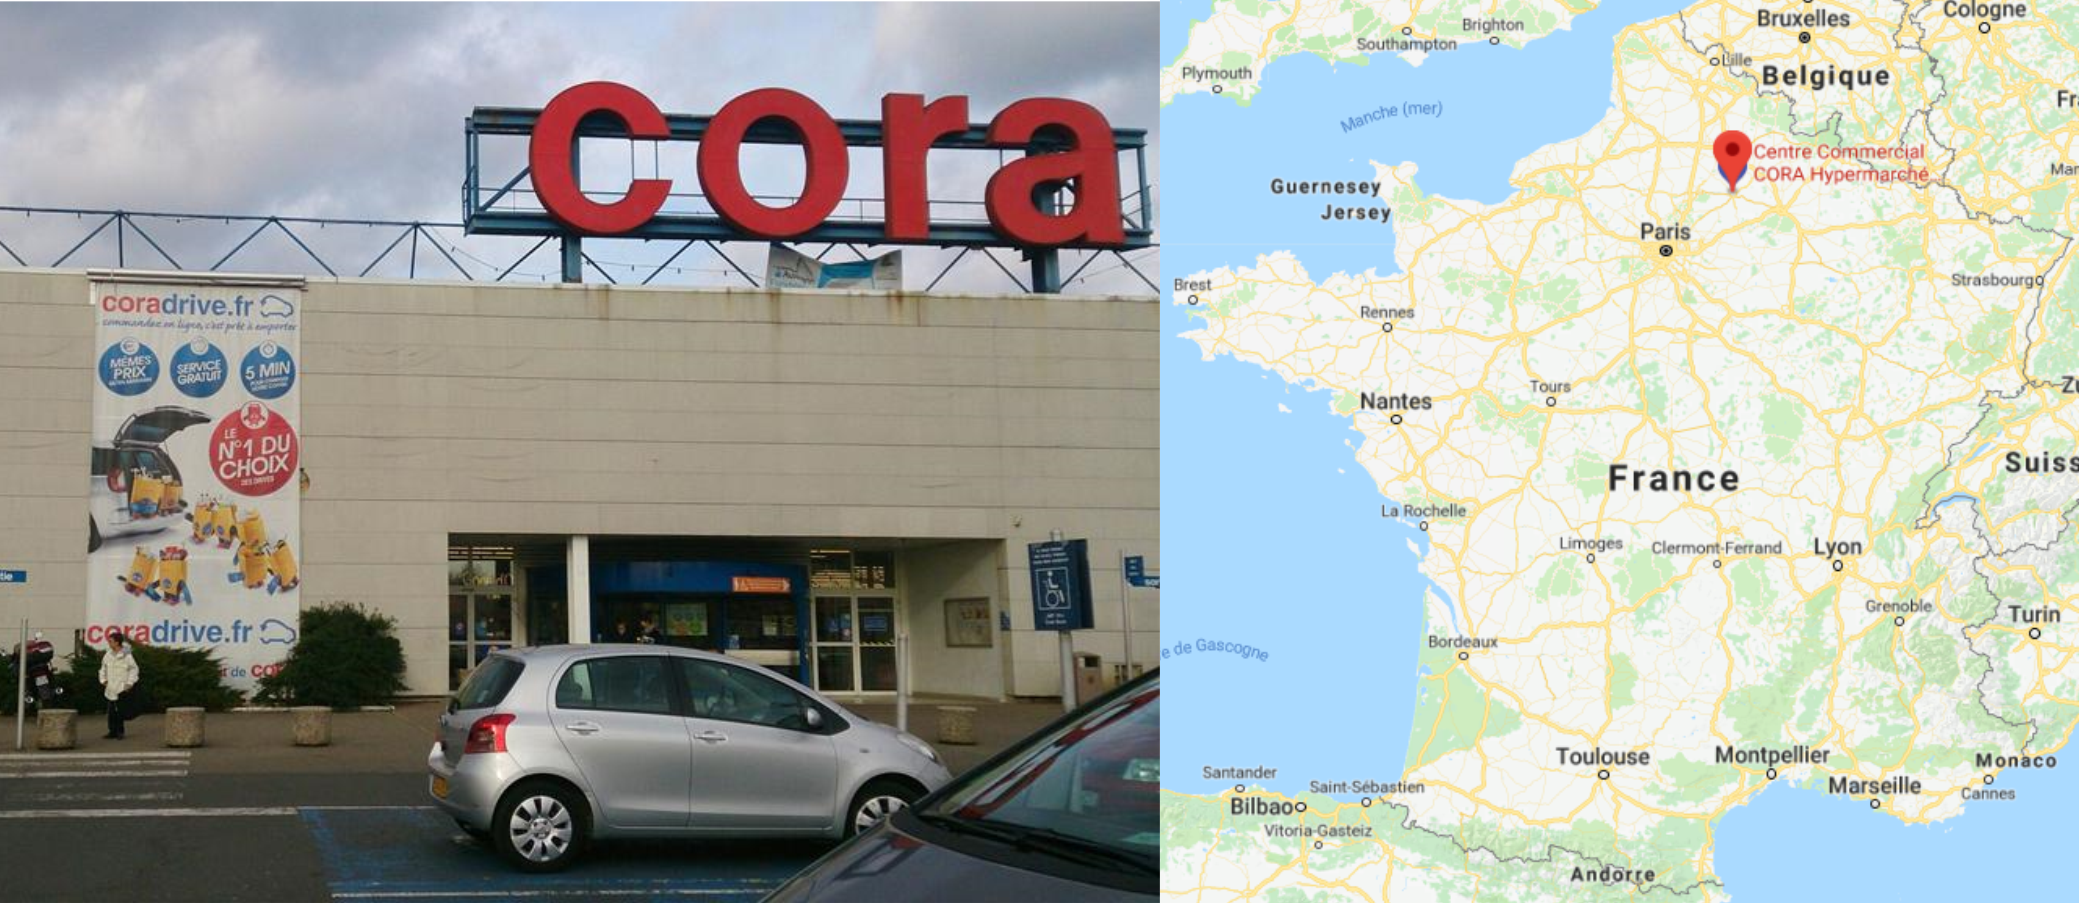 Centre commercial Cora Vichy